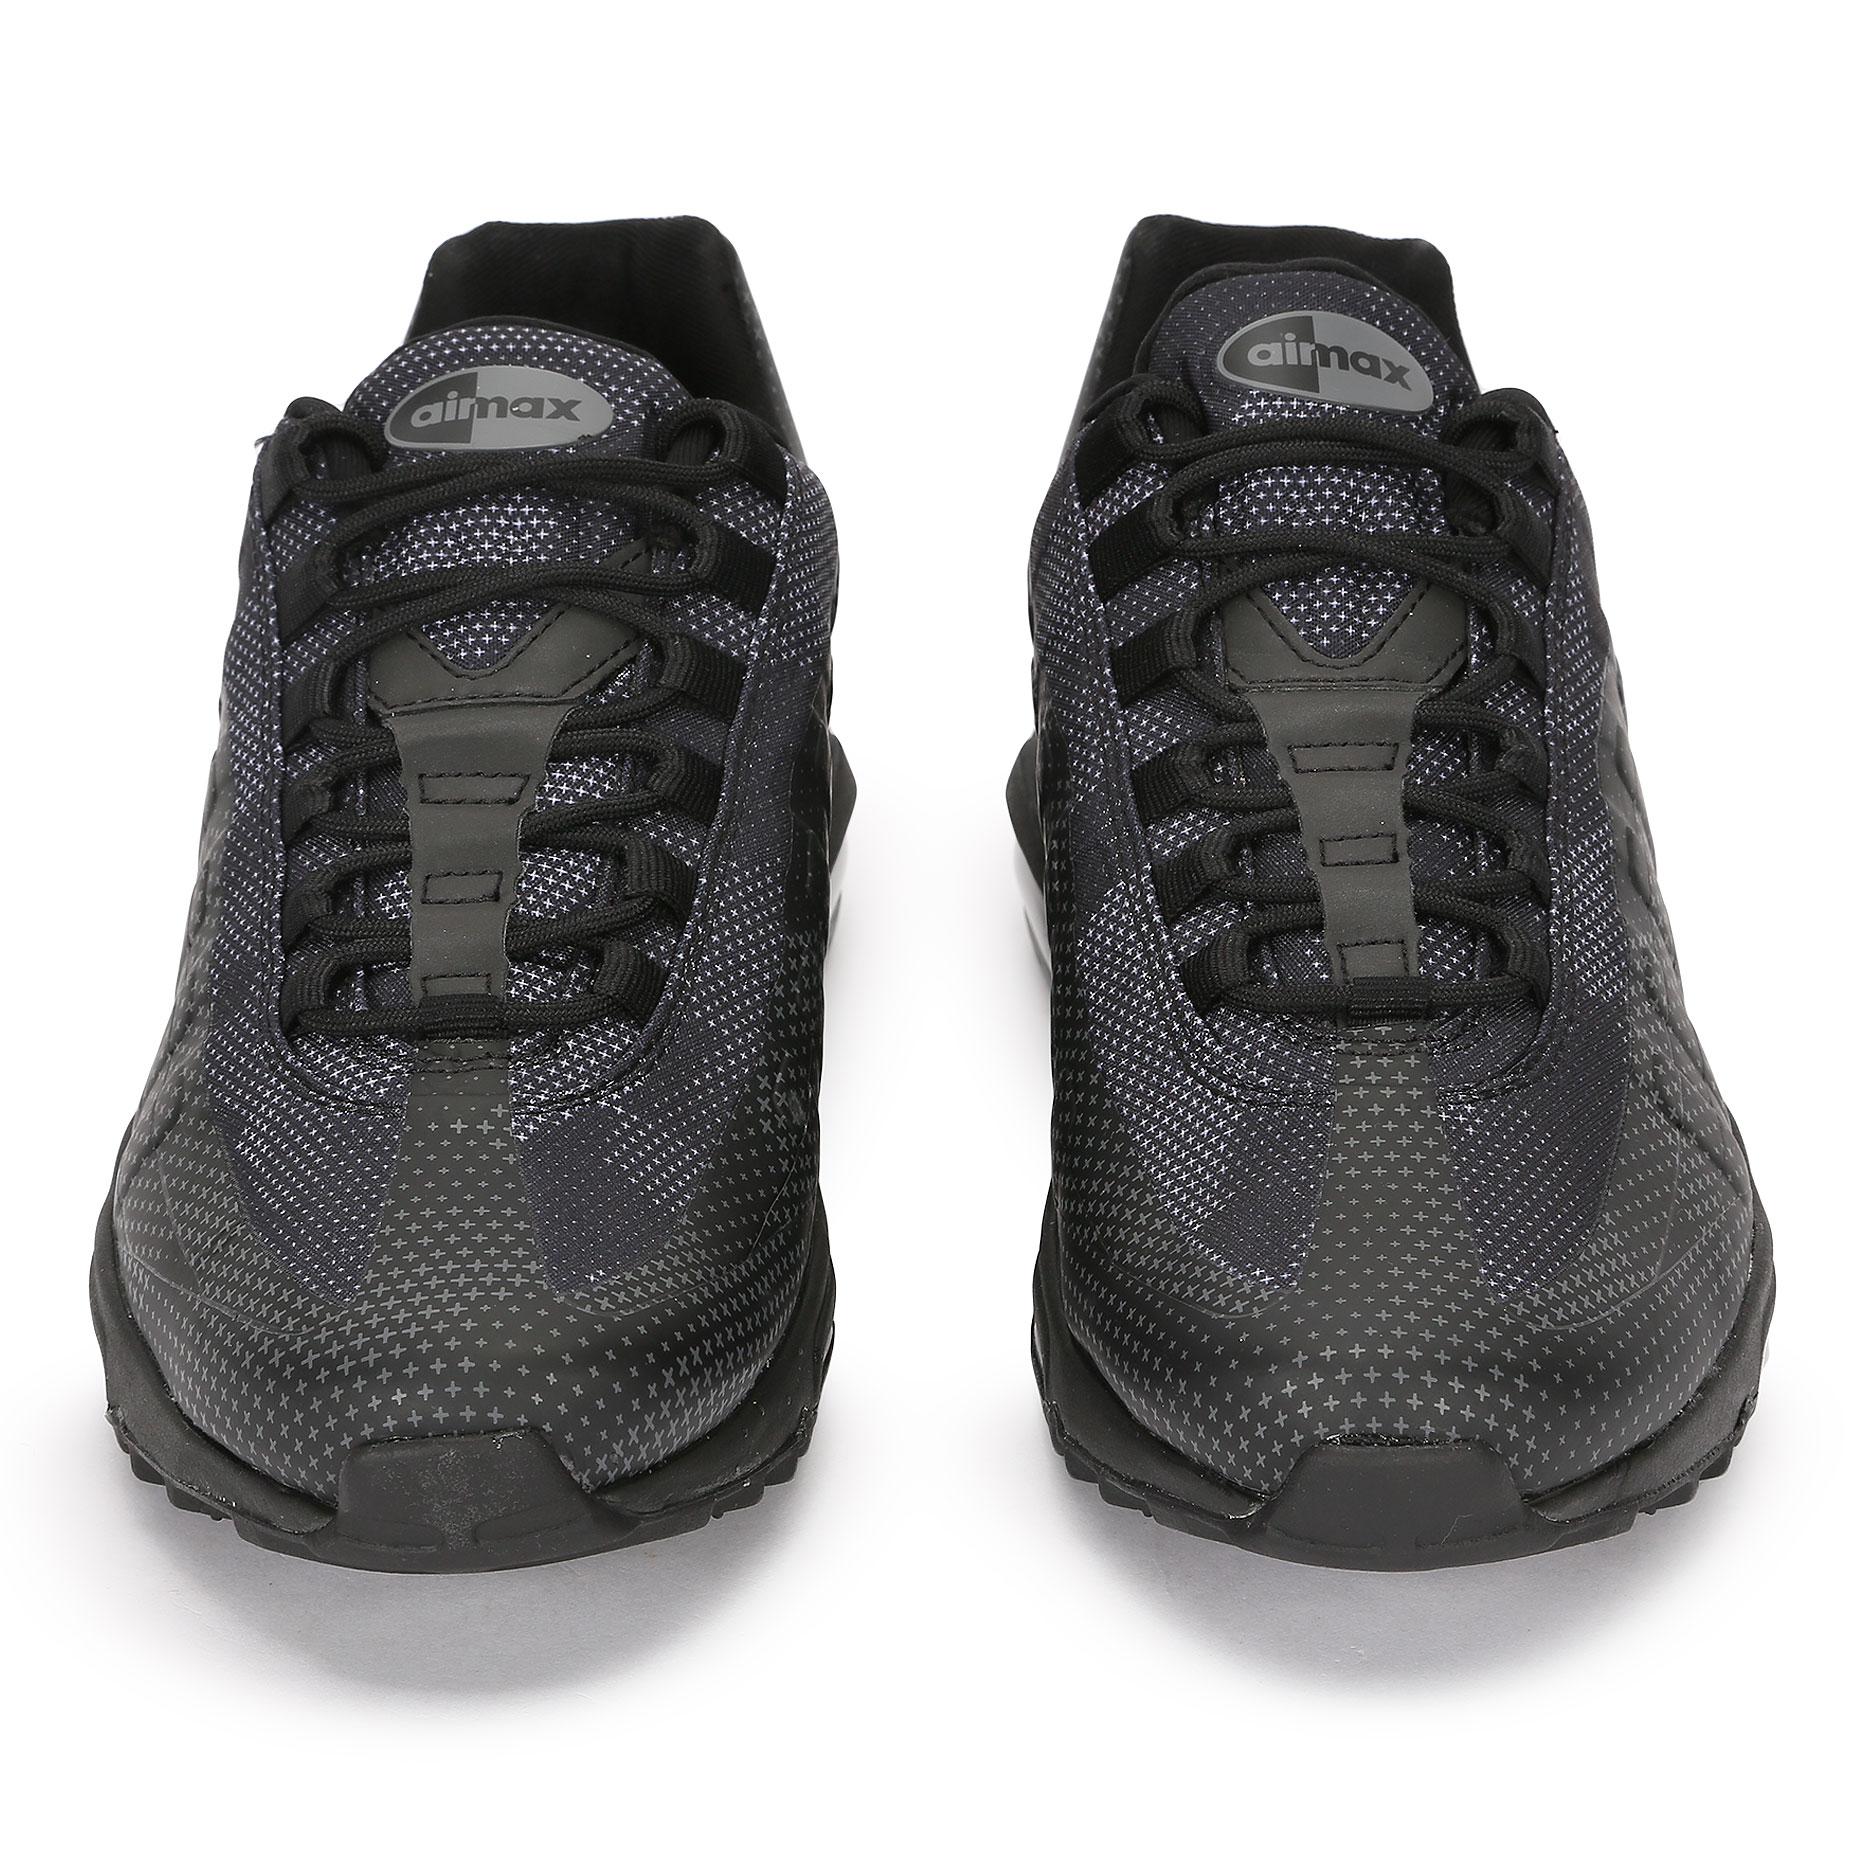 65e3ebb1 Кроссовки Air Max 95 от Nike (AJ3068-001) - продажа, цена, фото ...